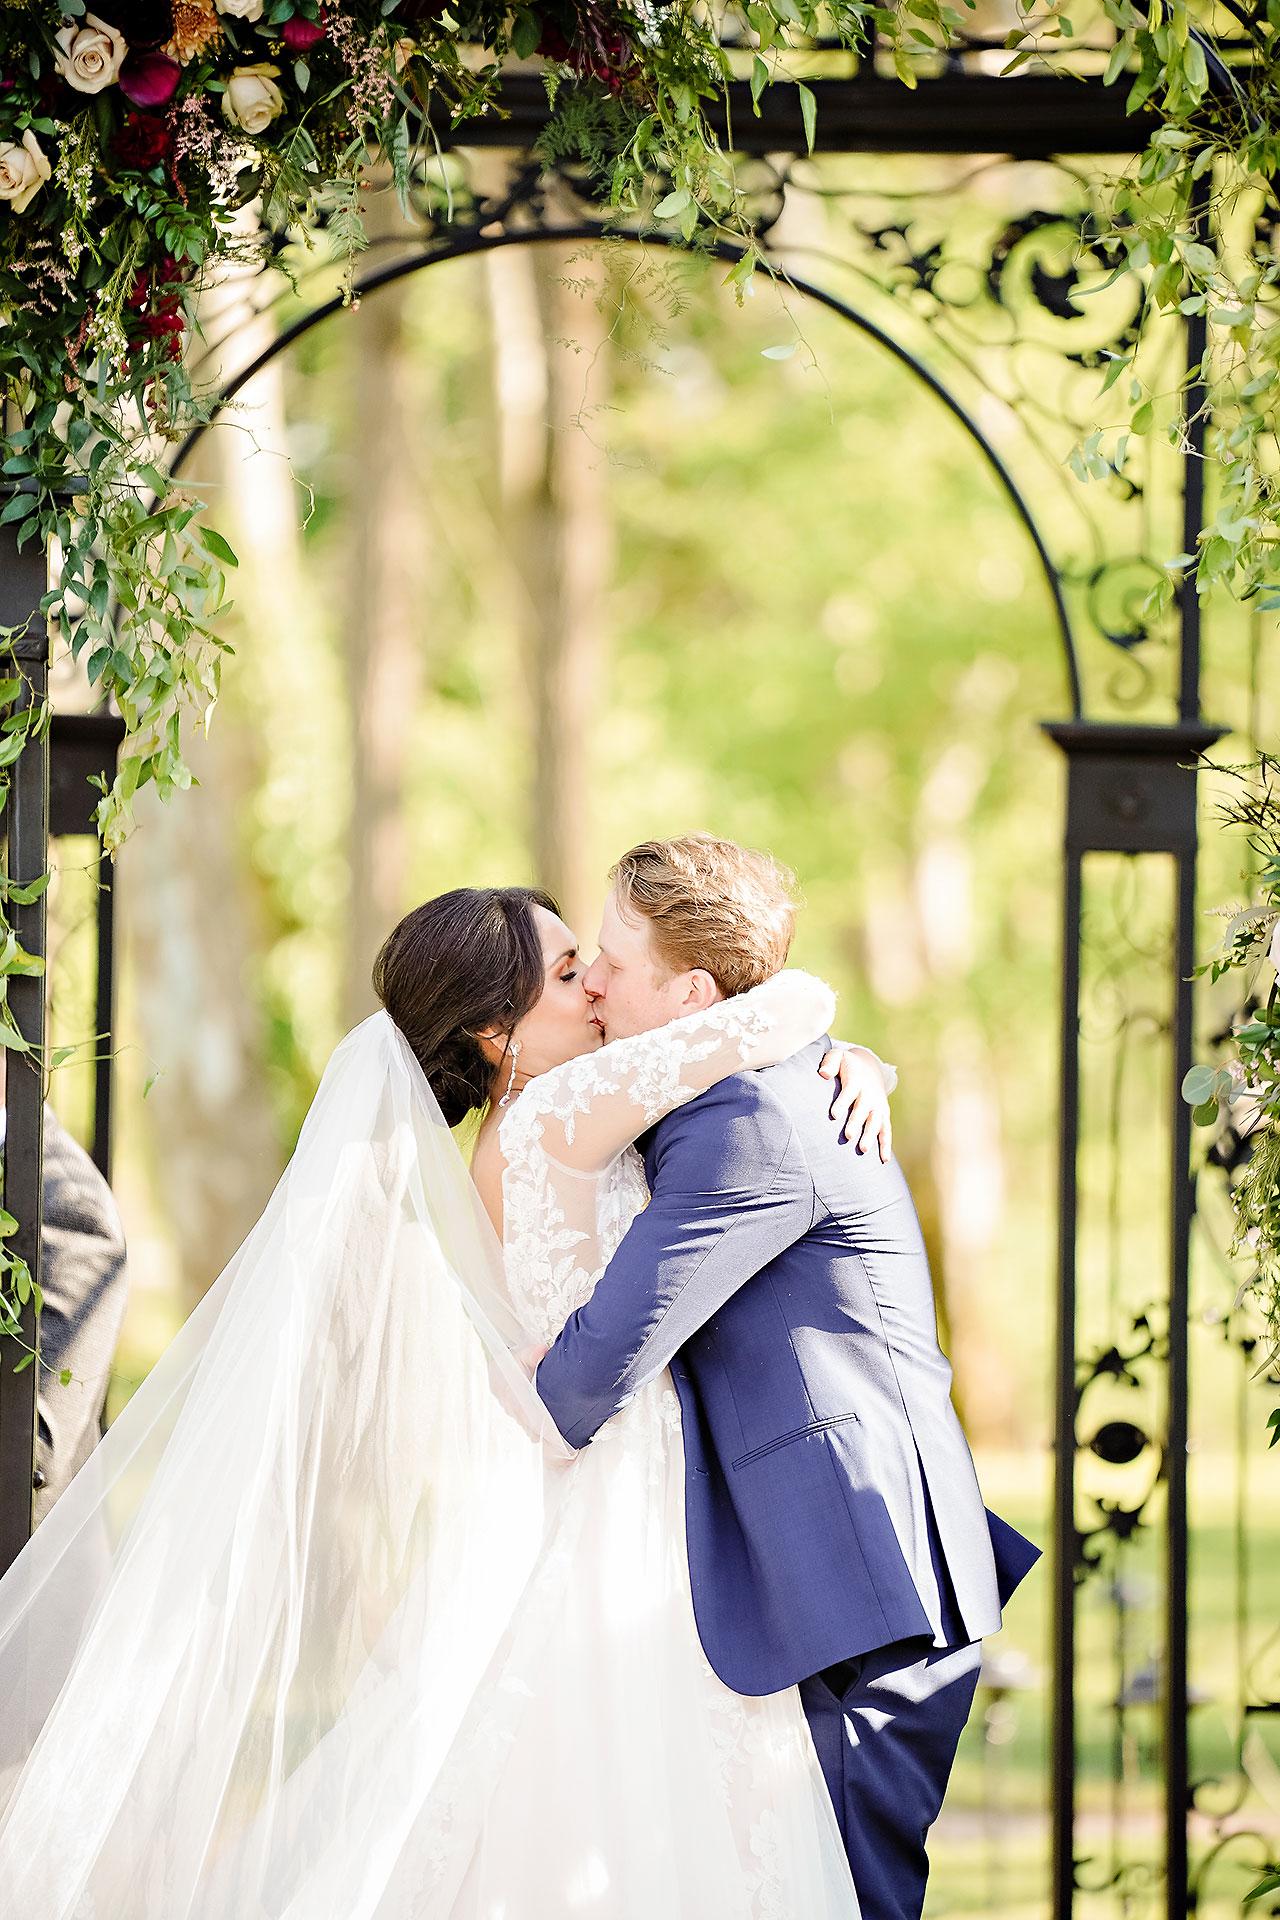 Nadia Parker Black Iris Estate Carmel Indiana Wedding May 2021 185